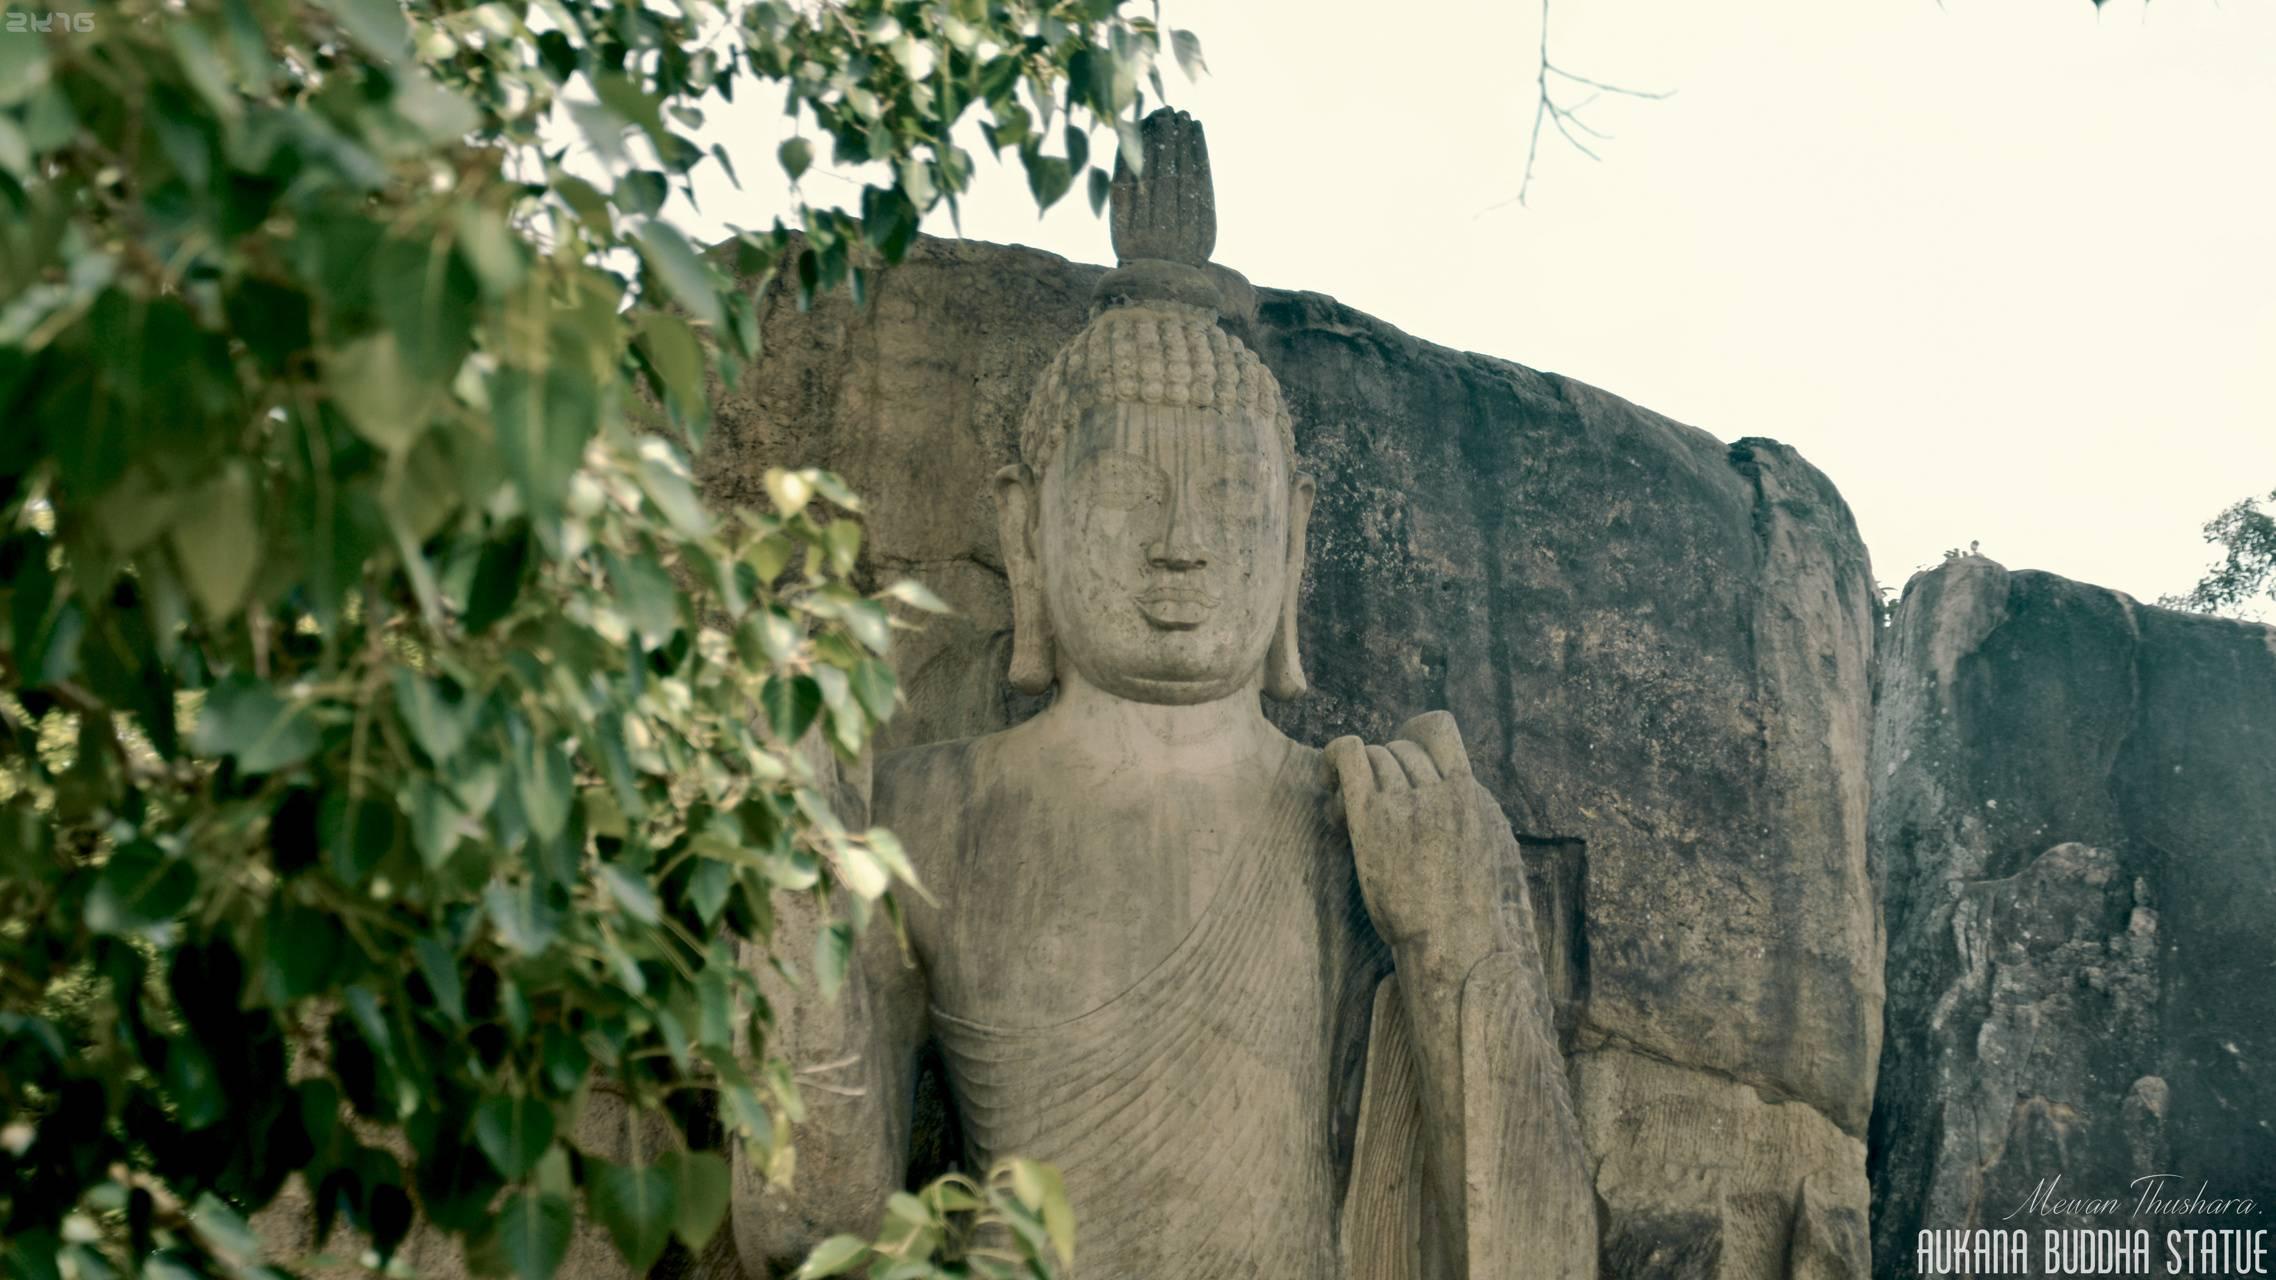 Aukana statue